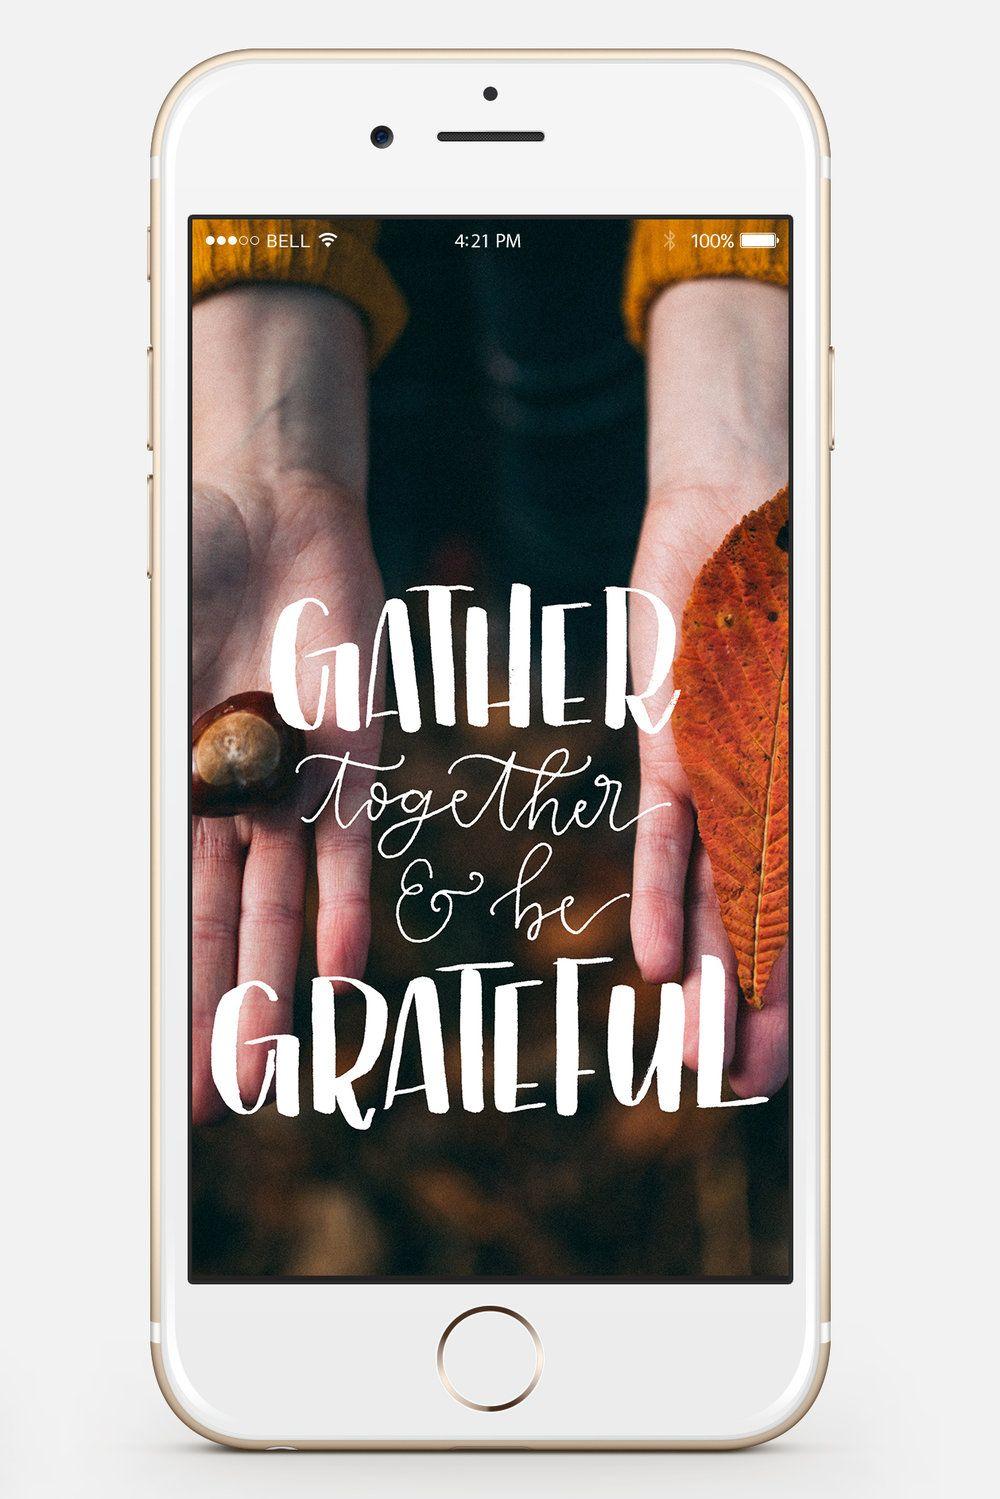 Gather & Grateful Phone lock screen from Lume & Penna